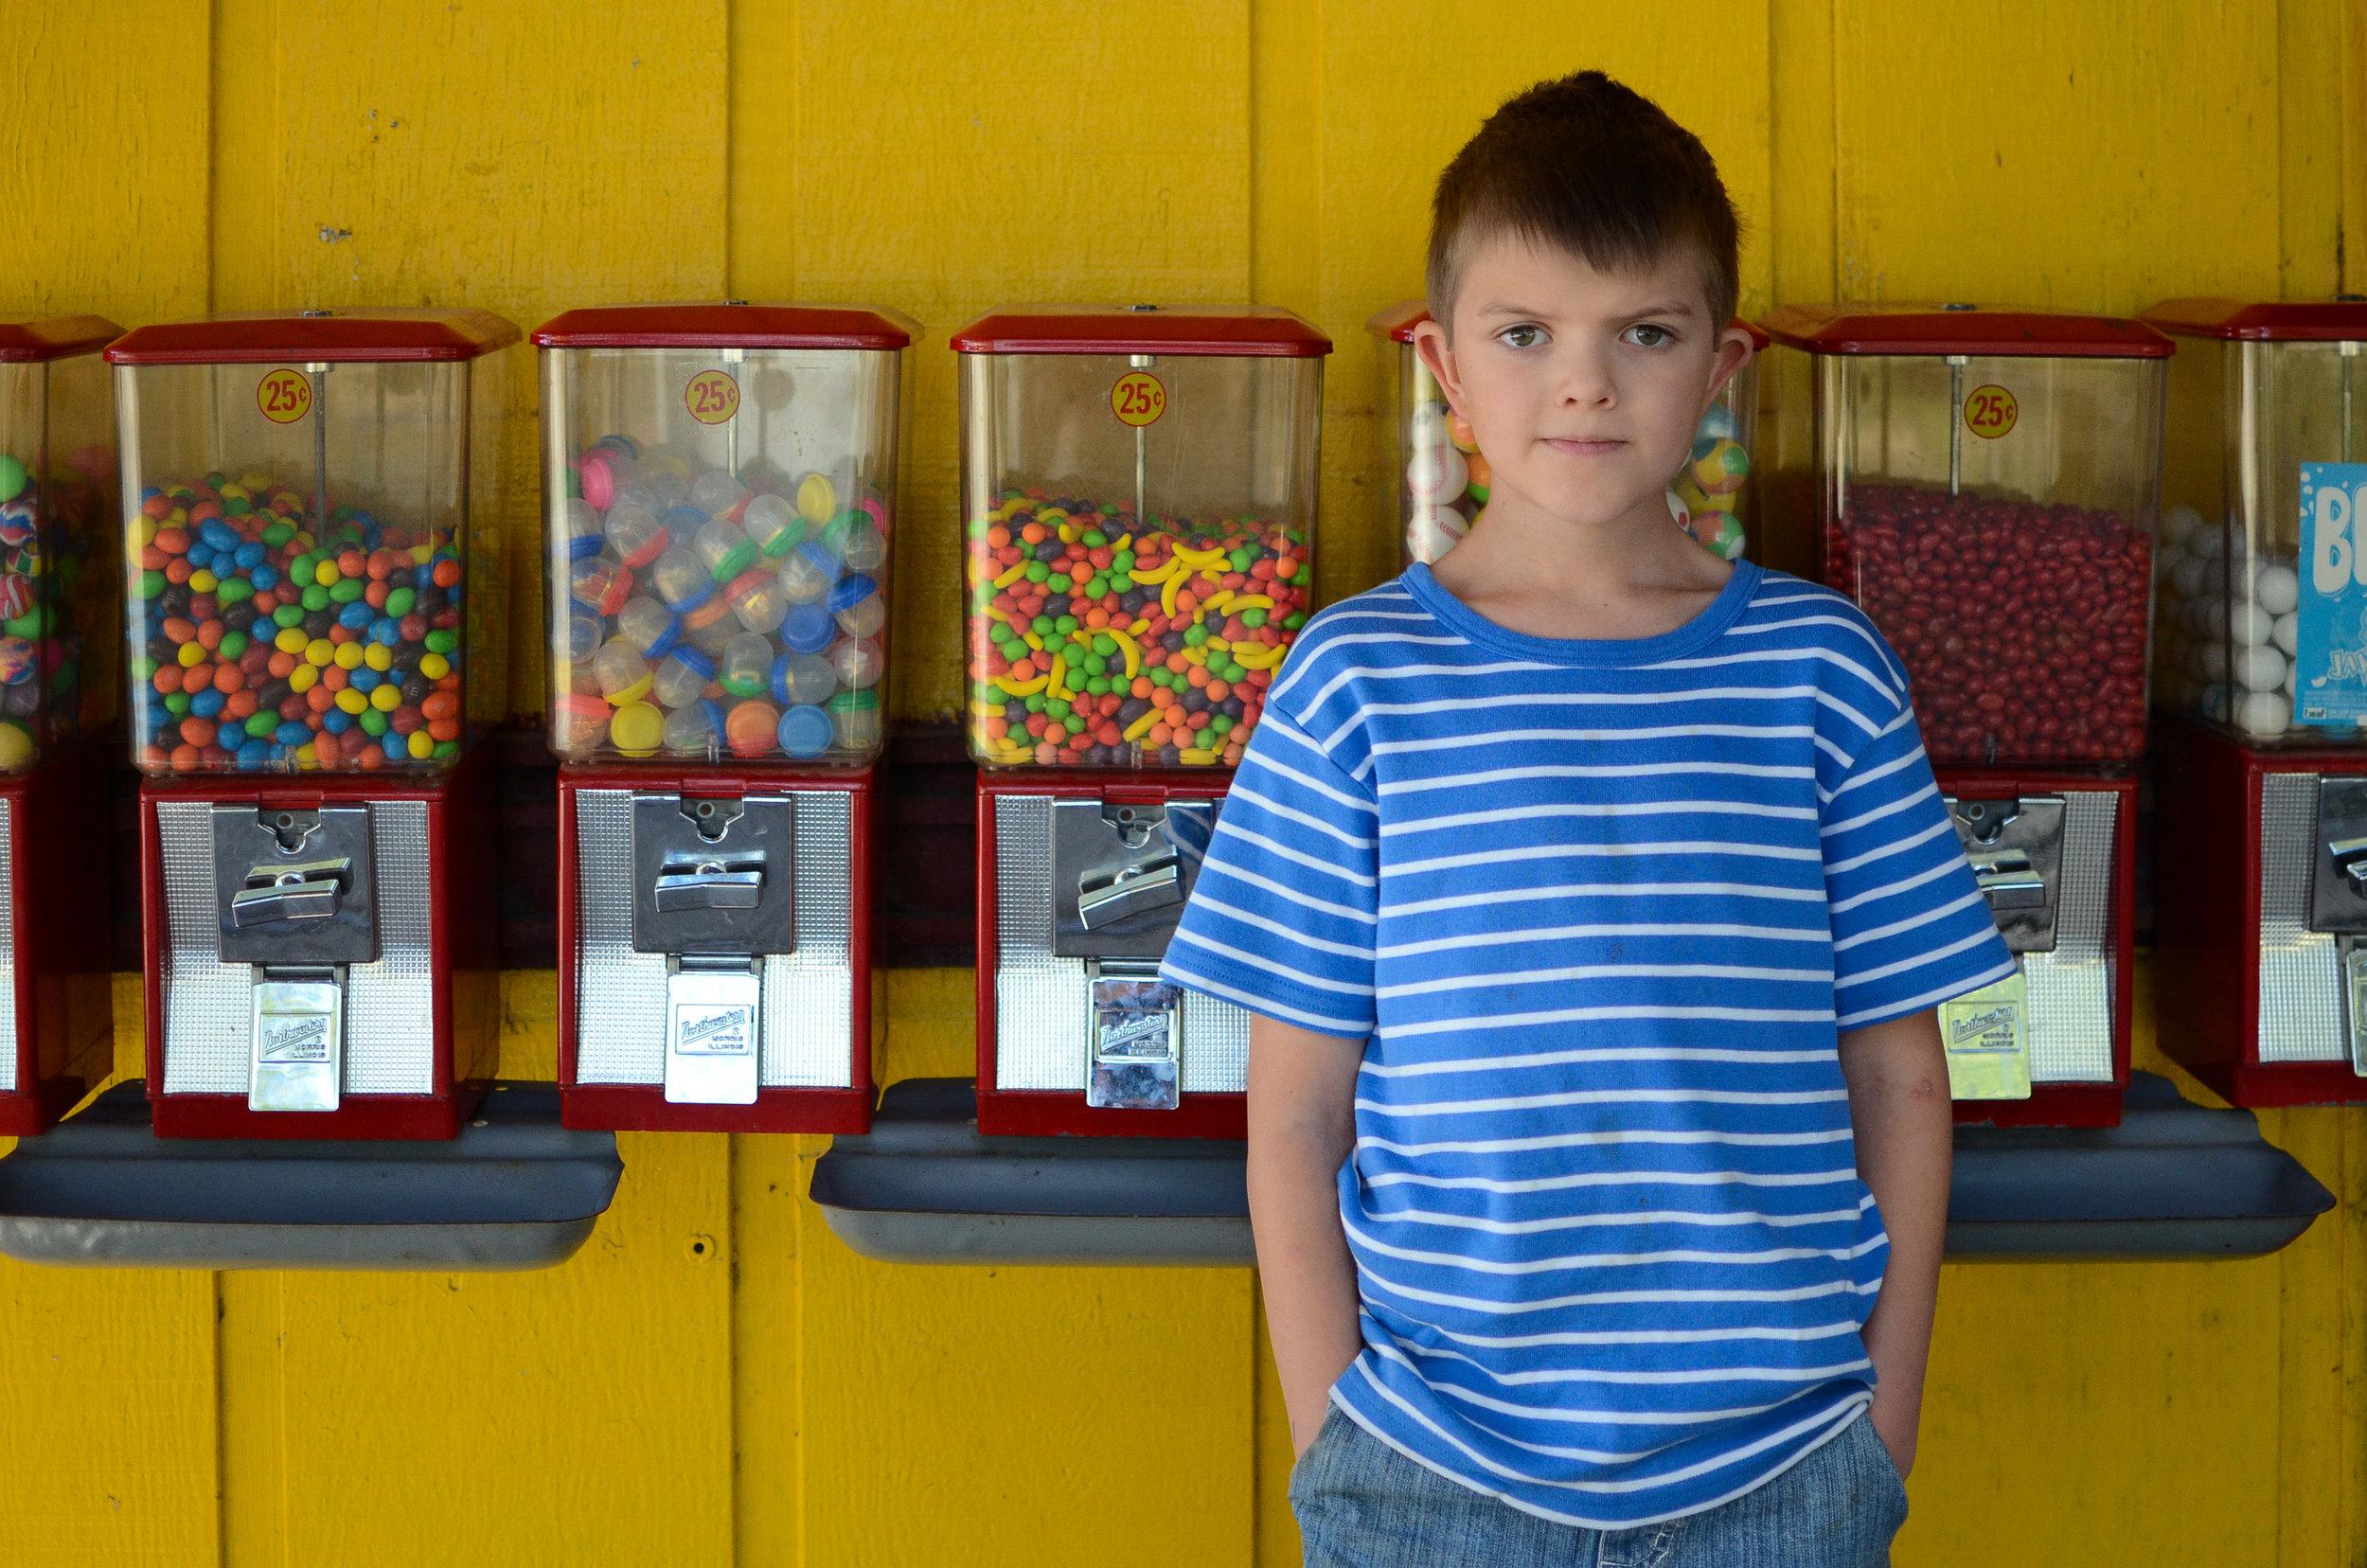 1-Ethan-candy-3-3669.jpg